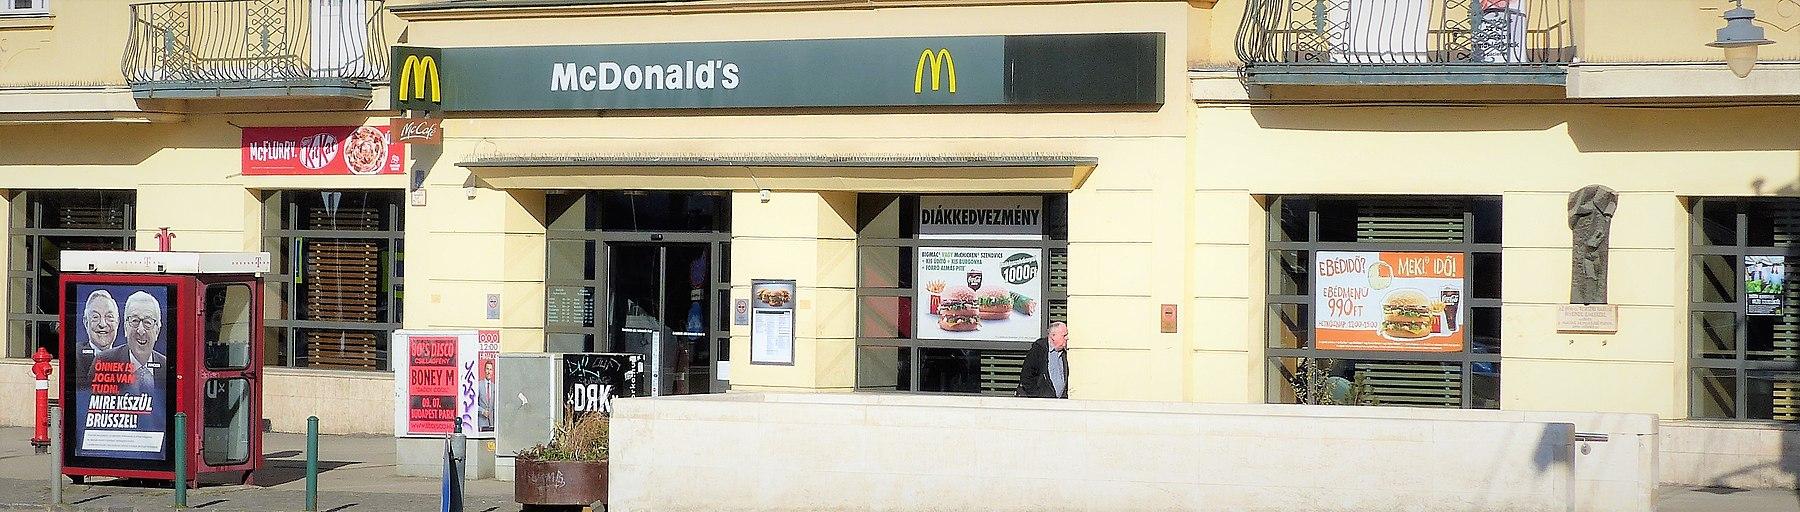 McDonald's -.jpg